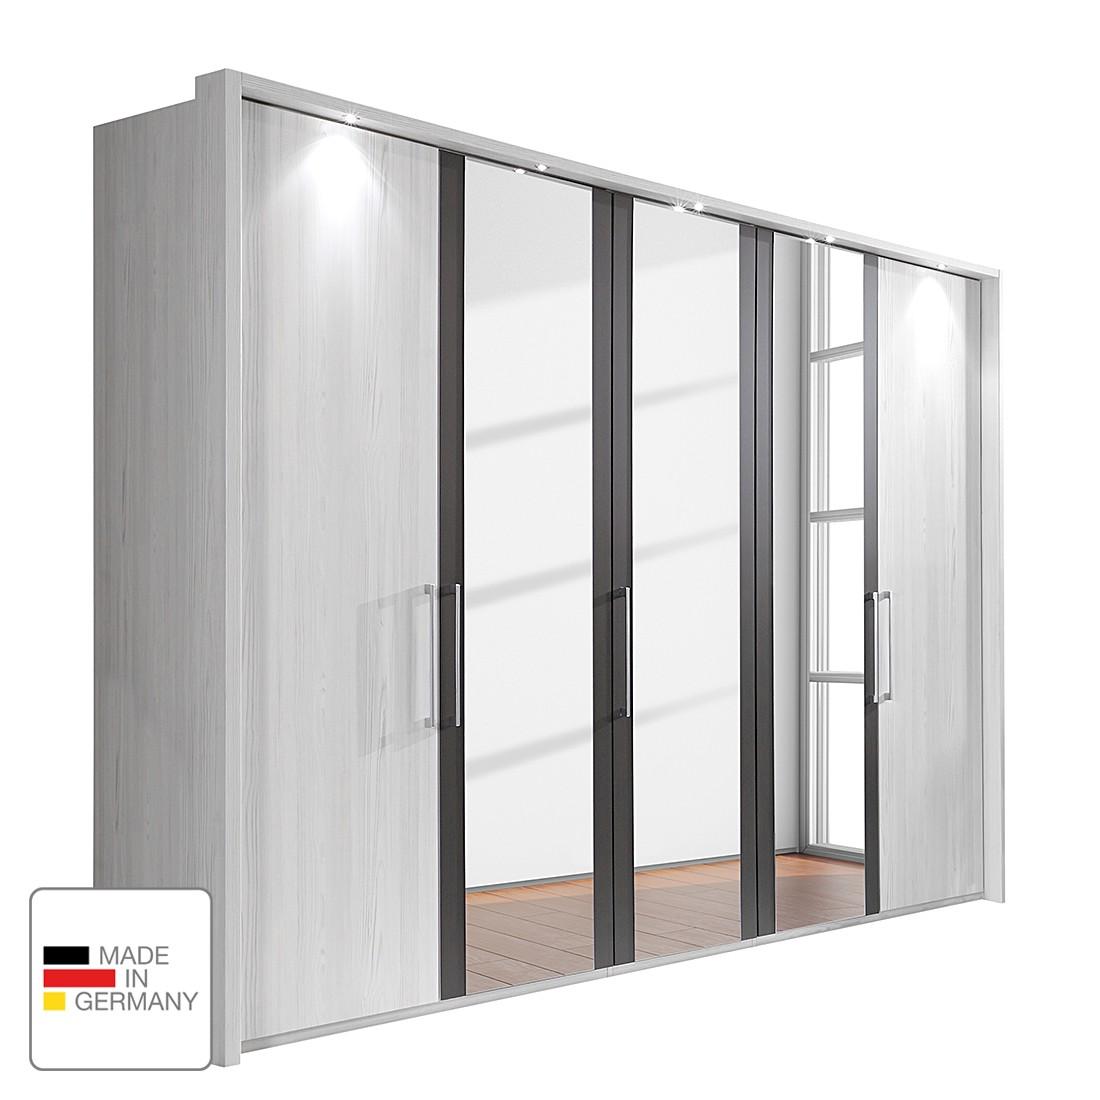 energie  A+, Draaideurkast Lissabon - Polar larikshouten look/Havanna - 300cm (6-deurs) - 2 spiegeldeuren - Met verlichte Passe-partout lijst, Wiemann